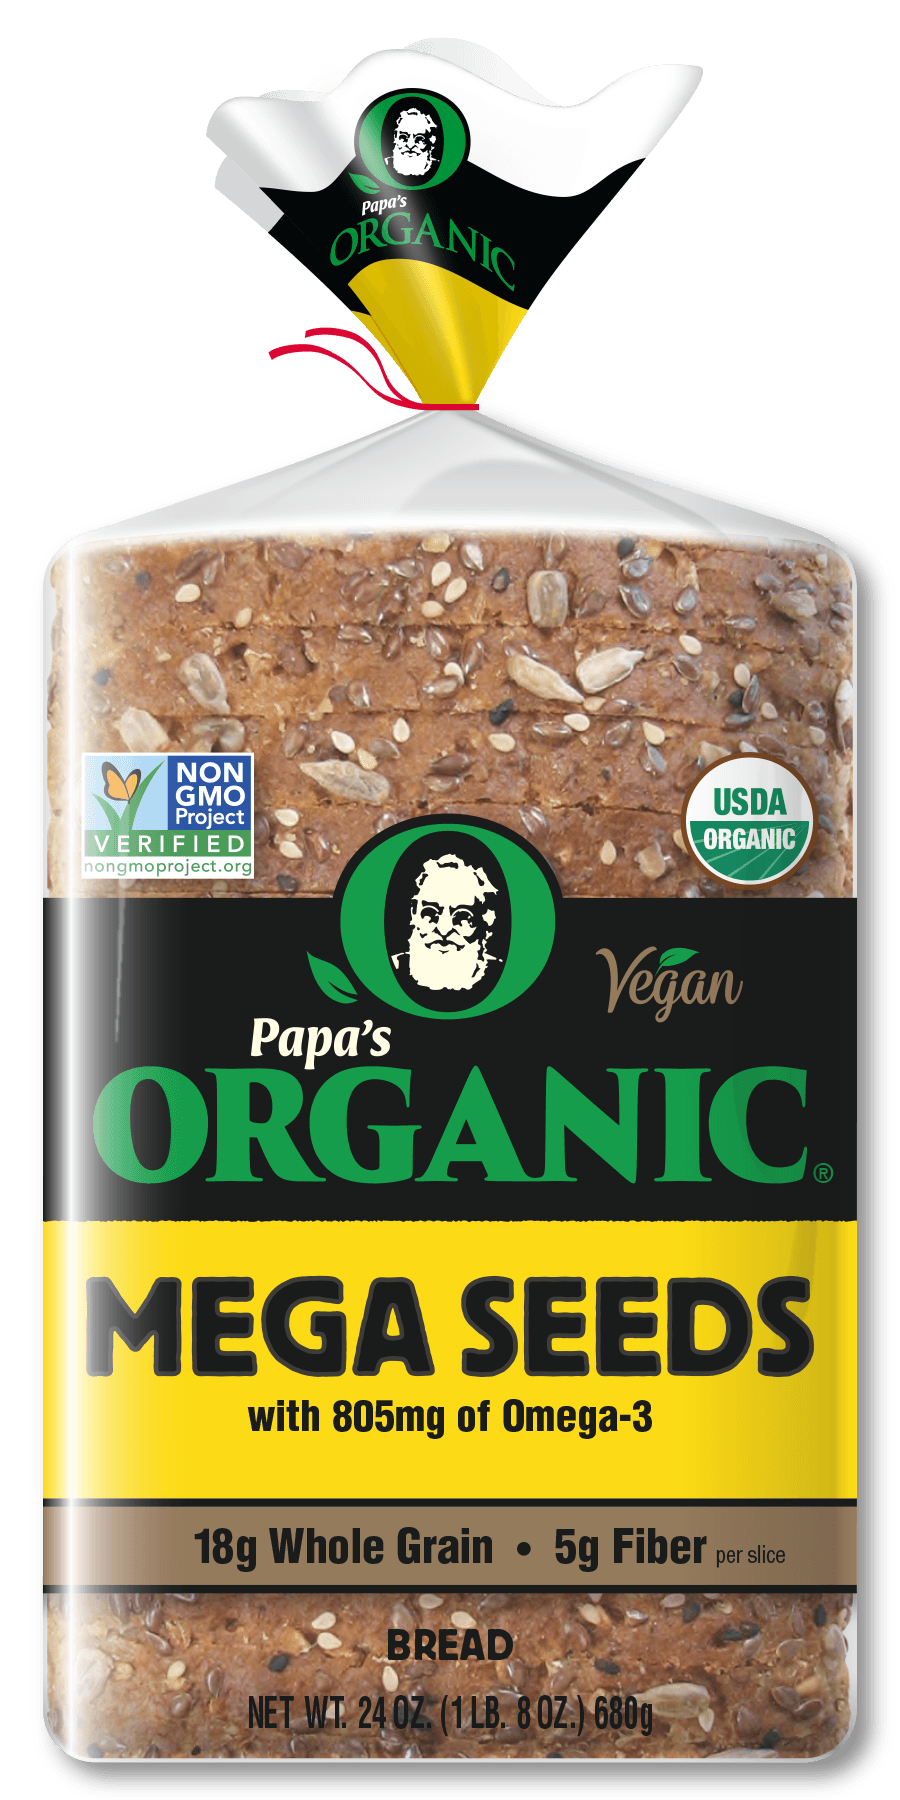 Papa's Organic Mega Seeds